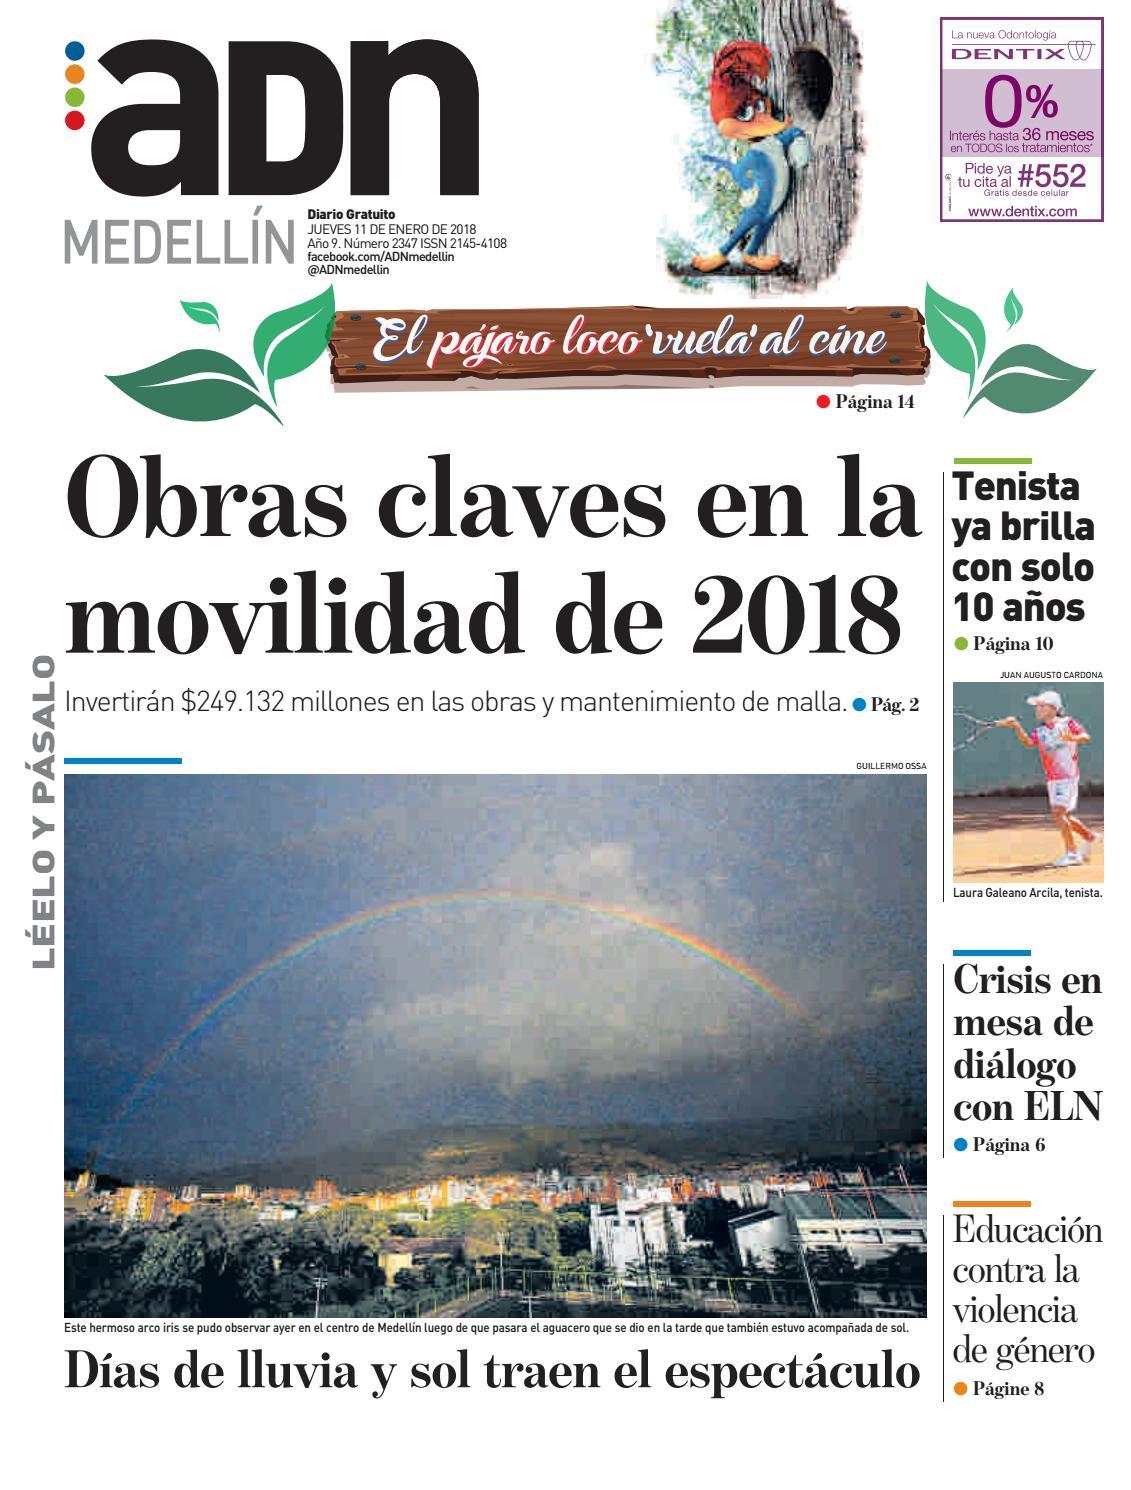 ADN Medellín 11 de enero by diarioadn.co - issuu